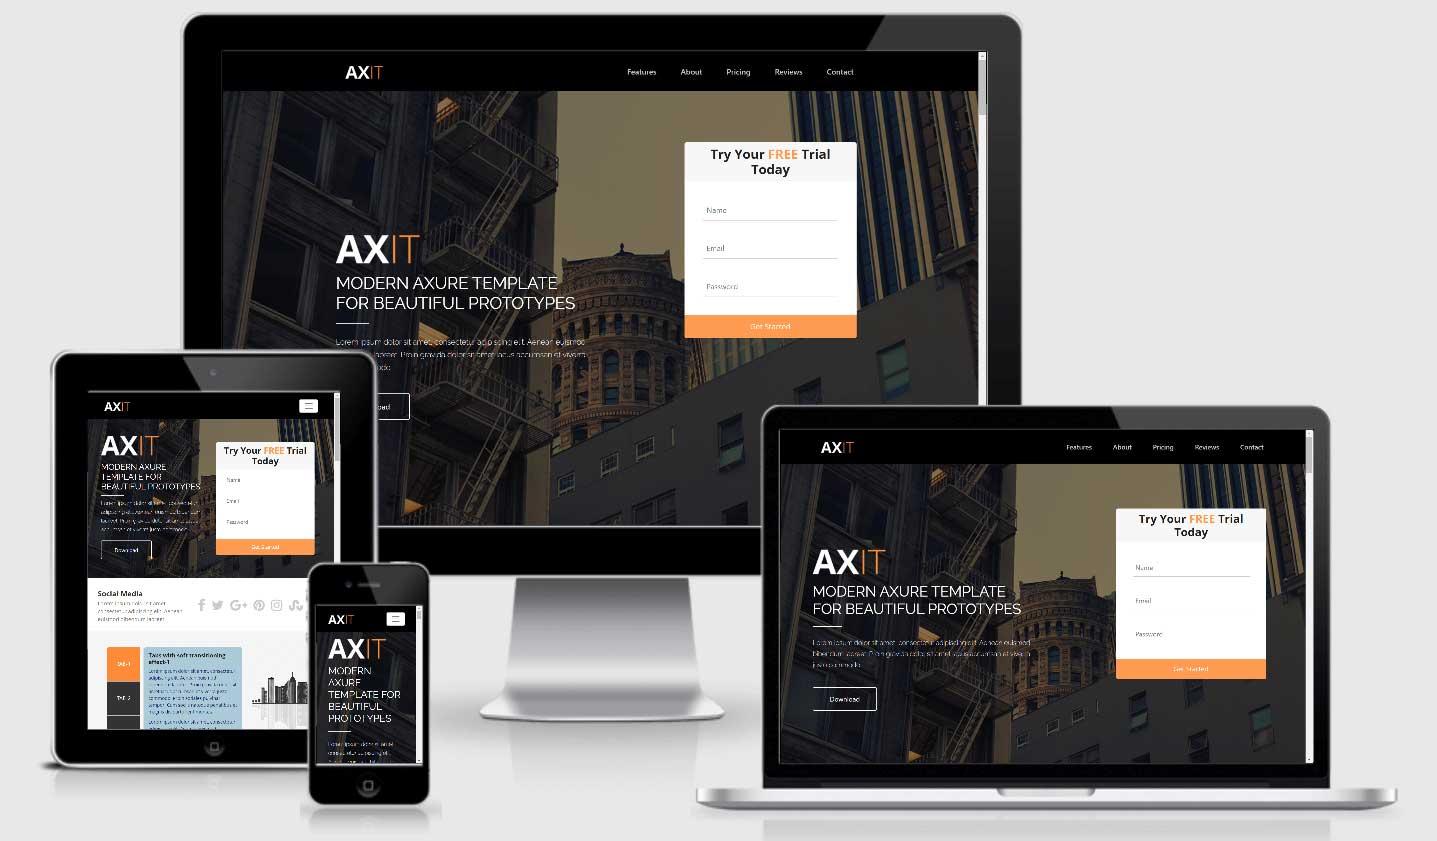 https://khadizachowdhury.com/wp-content/uploads/2021/05/Axit.jpg